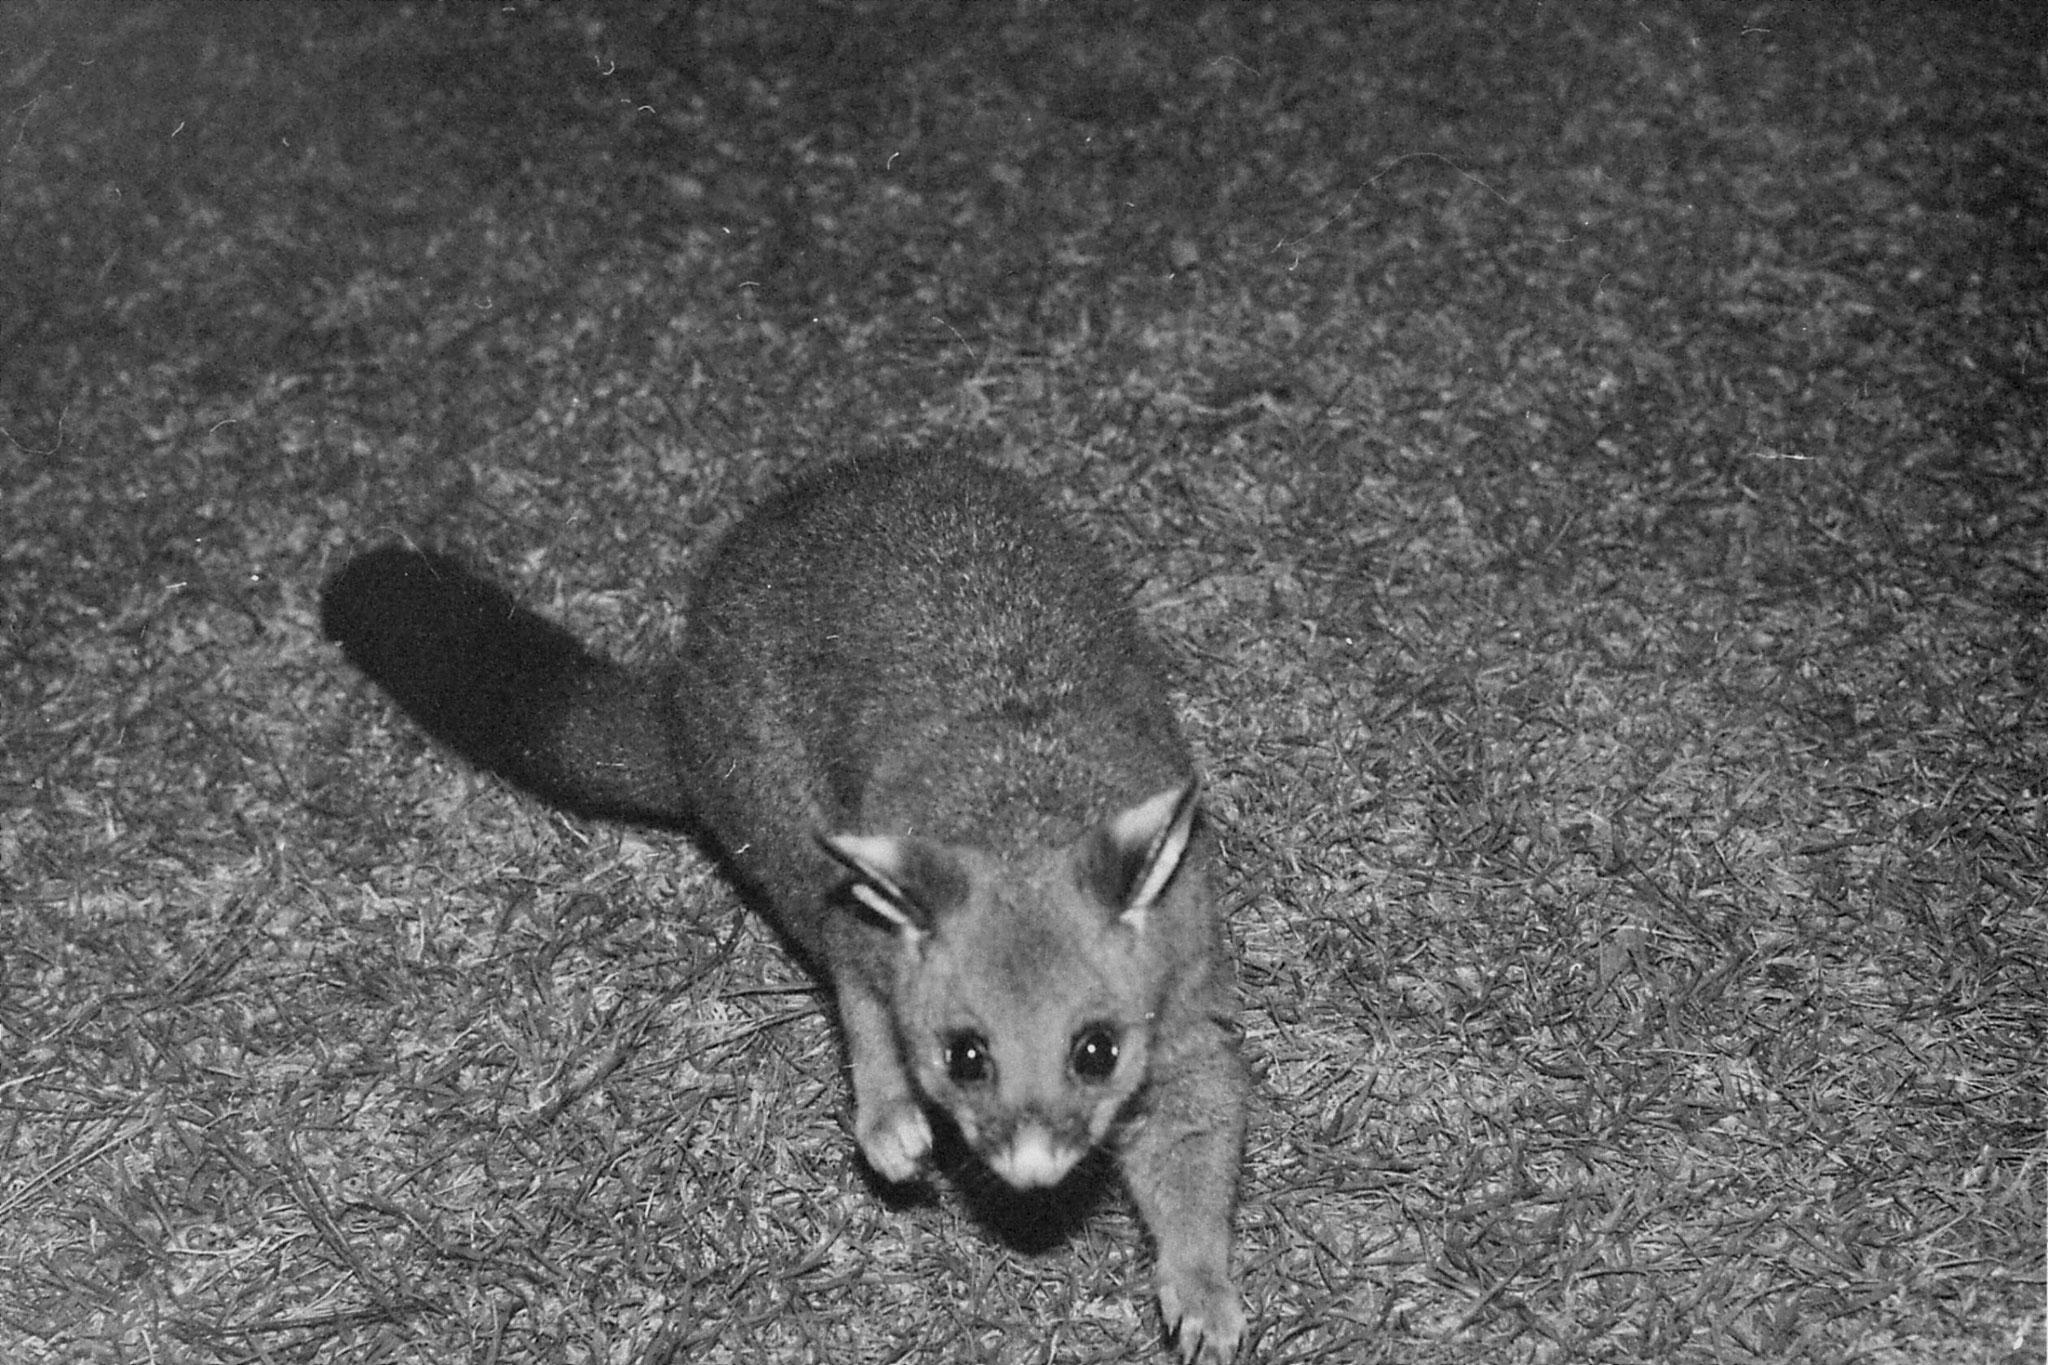 22/9/1990: 7: Dimboola Caravan Park possums